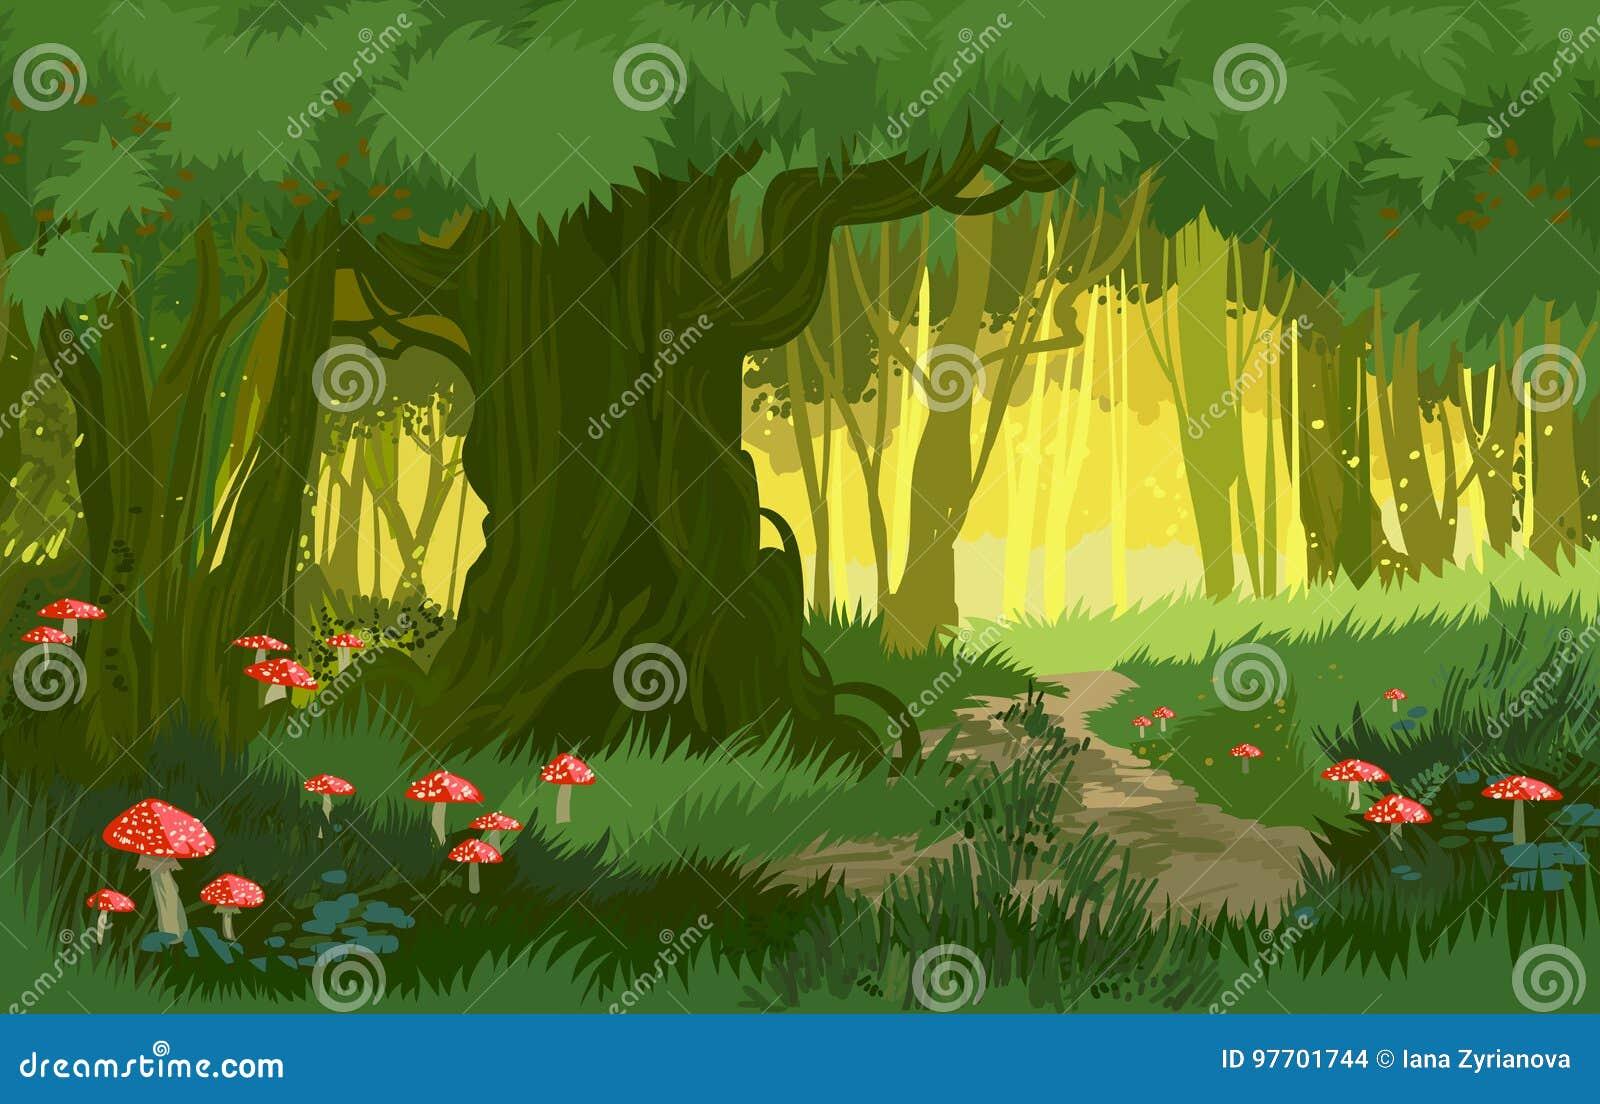 vector illustration bright green summer magical forest vector